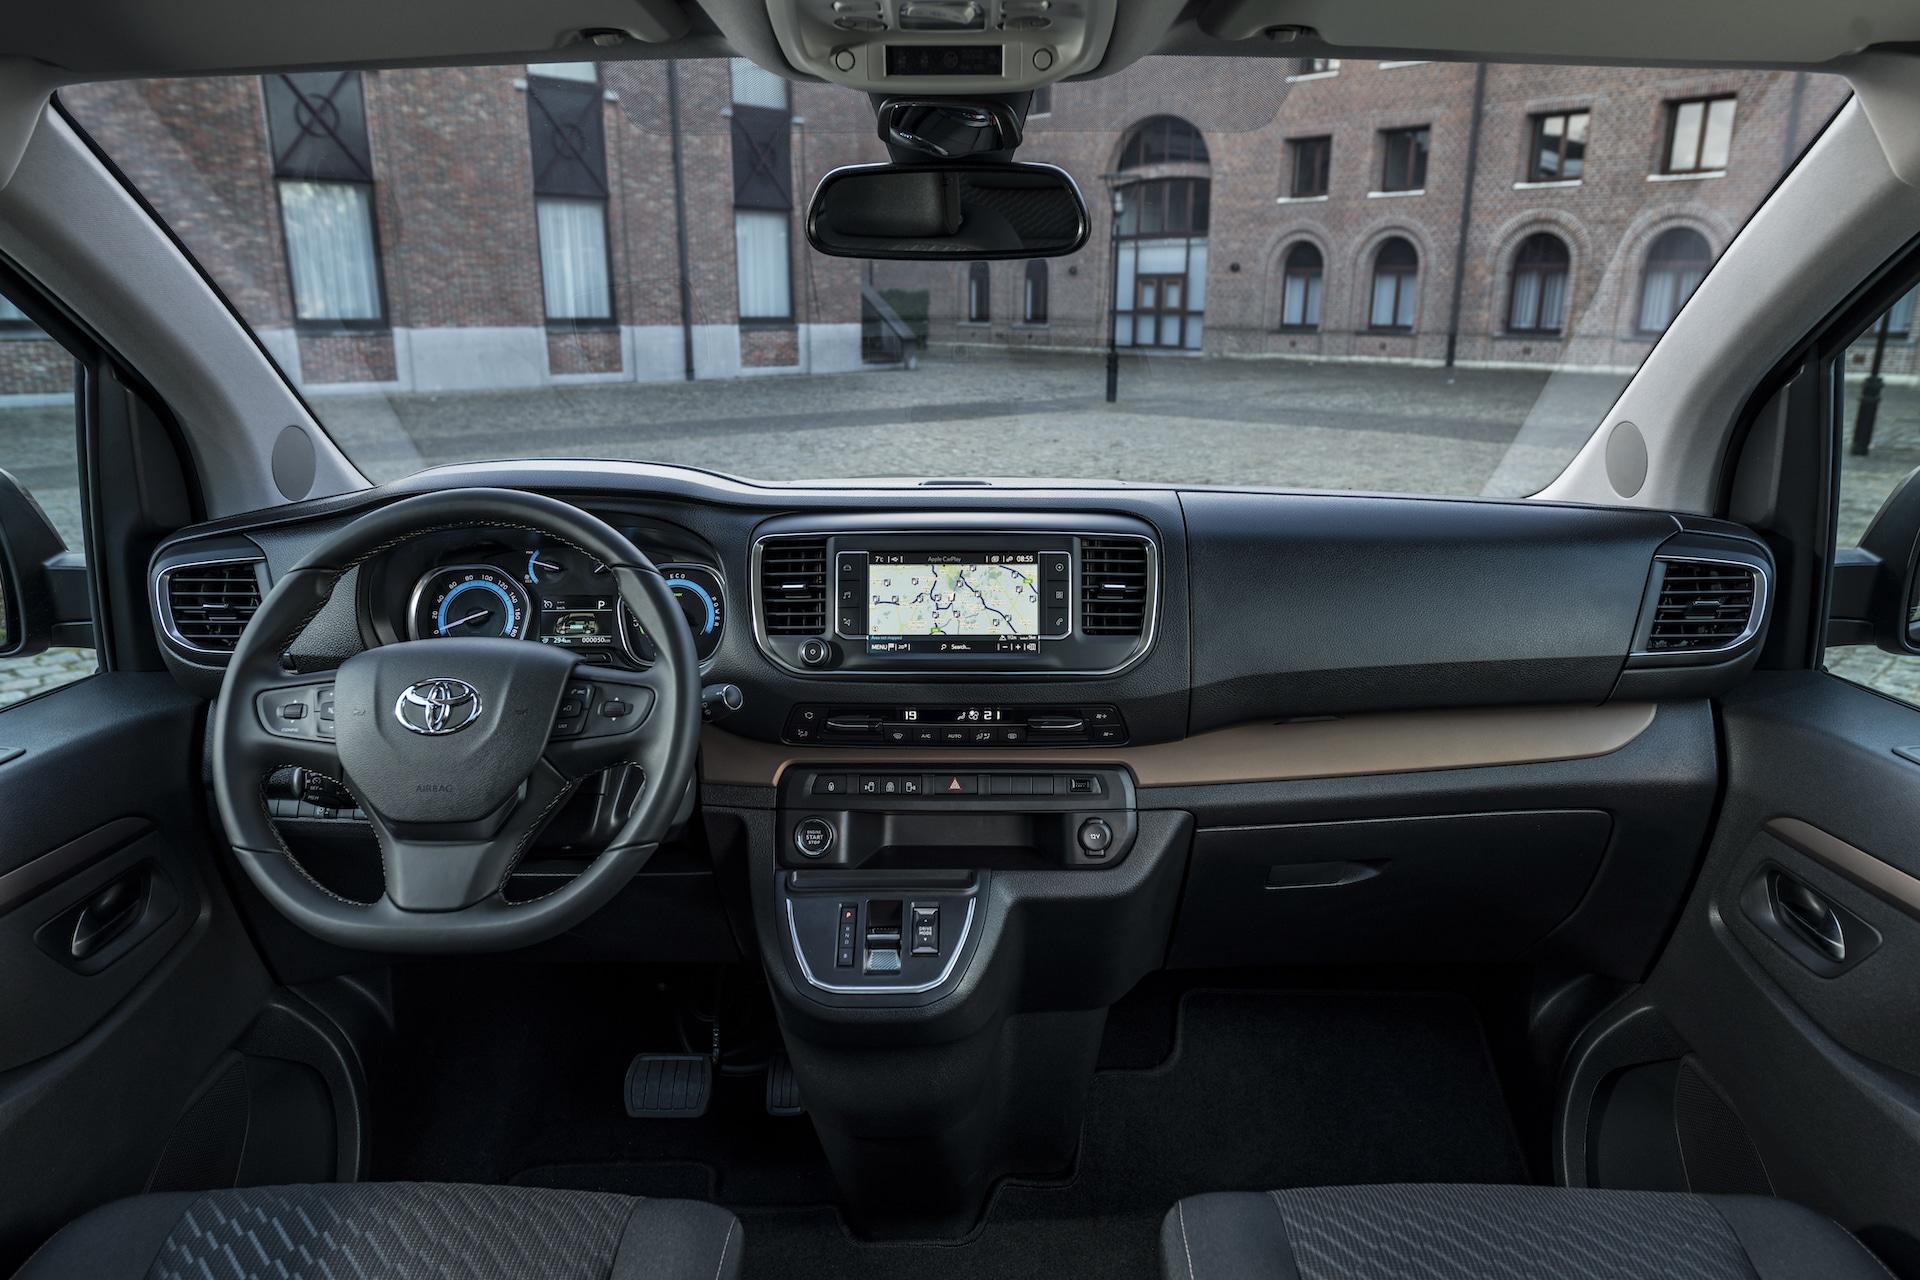 Toyota-Proace-Elektroauto-Cockpit